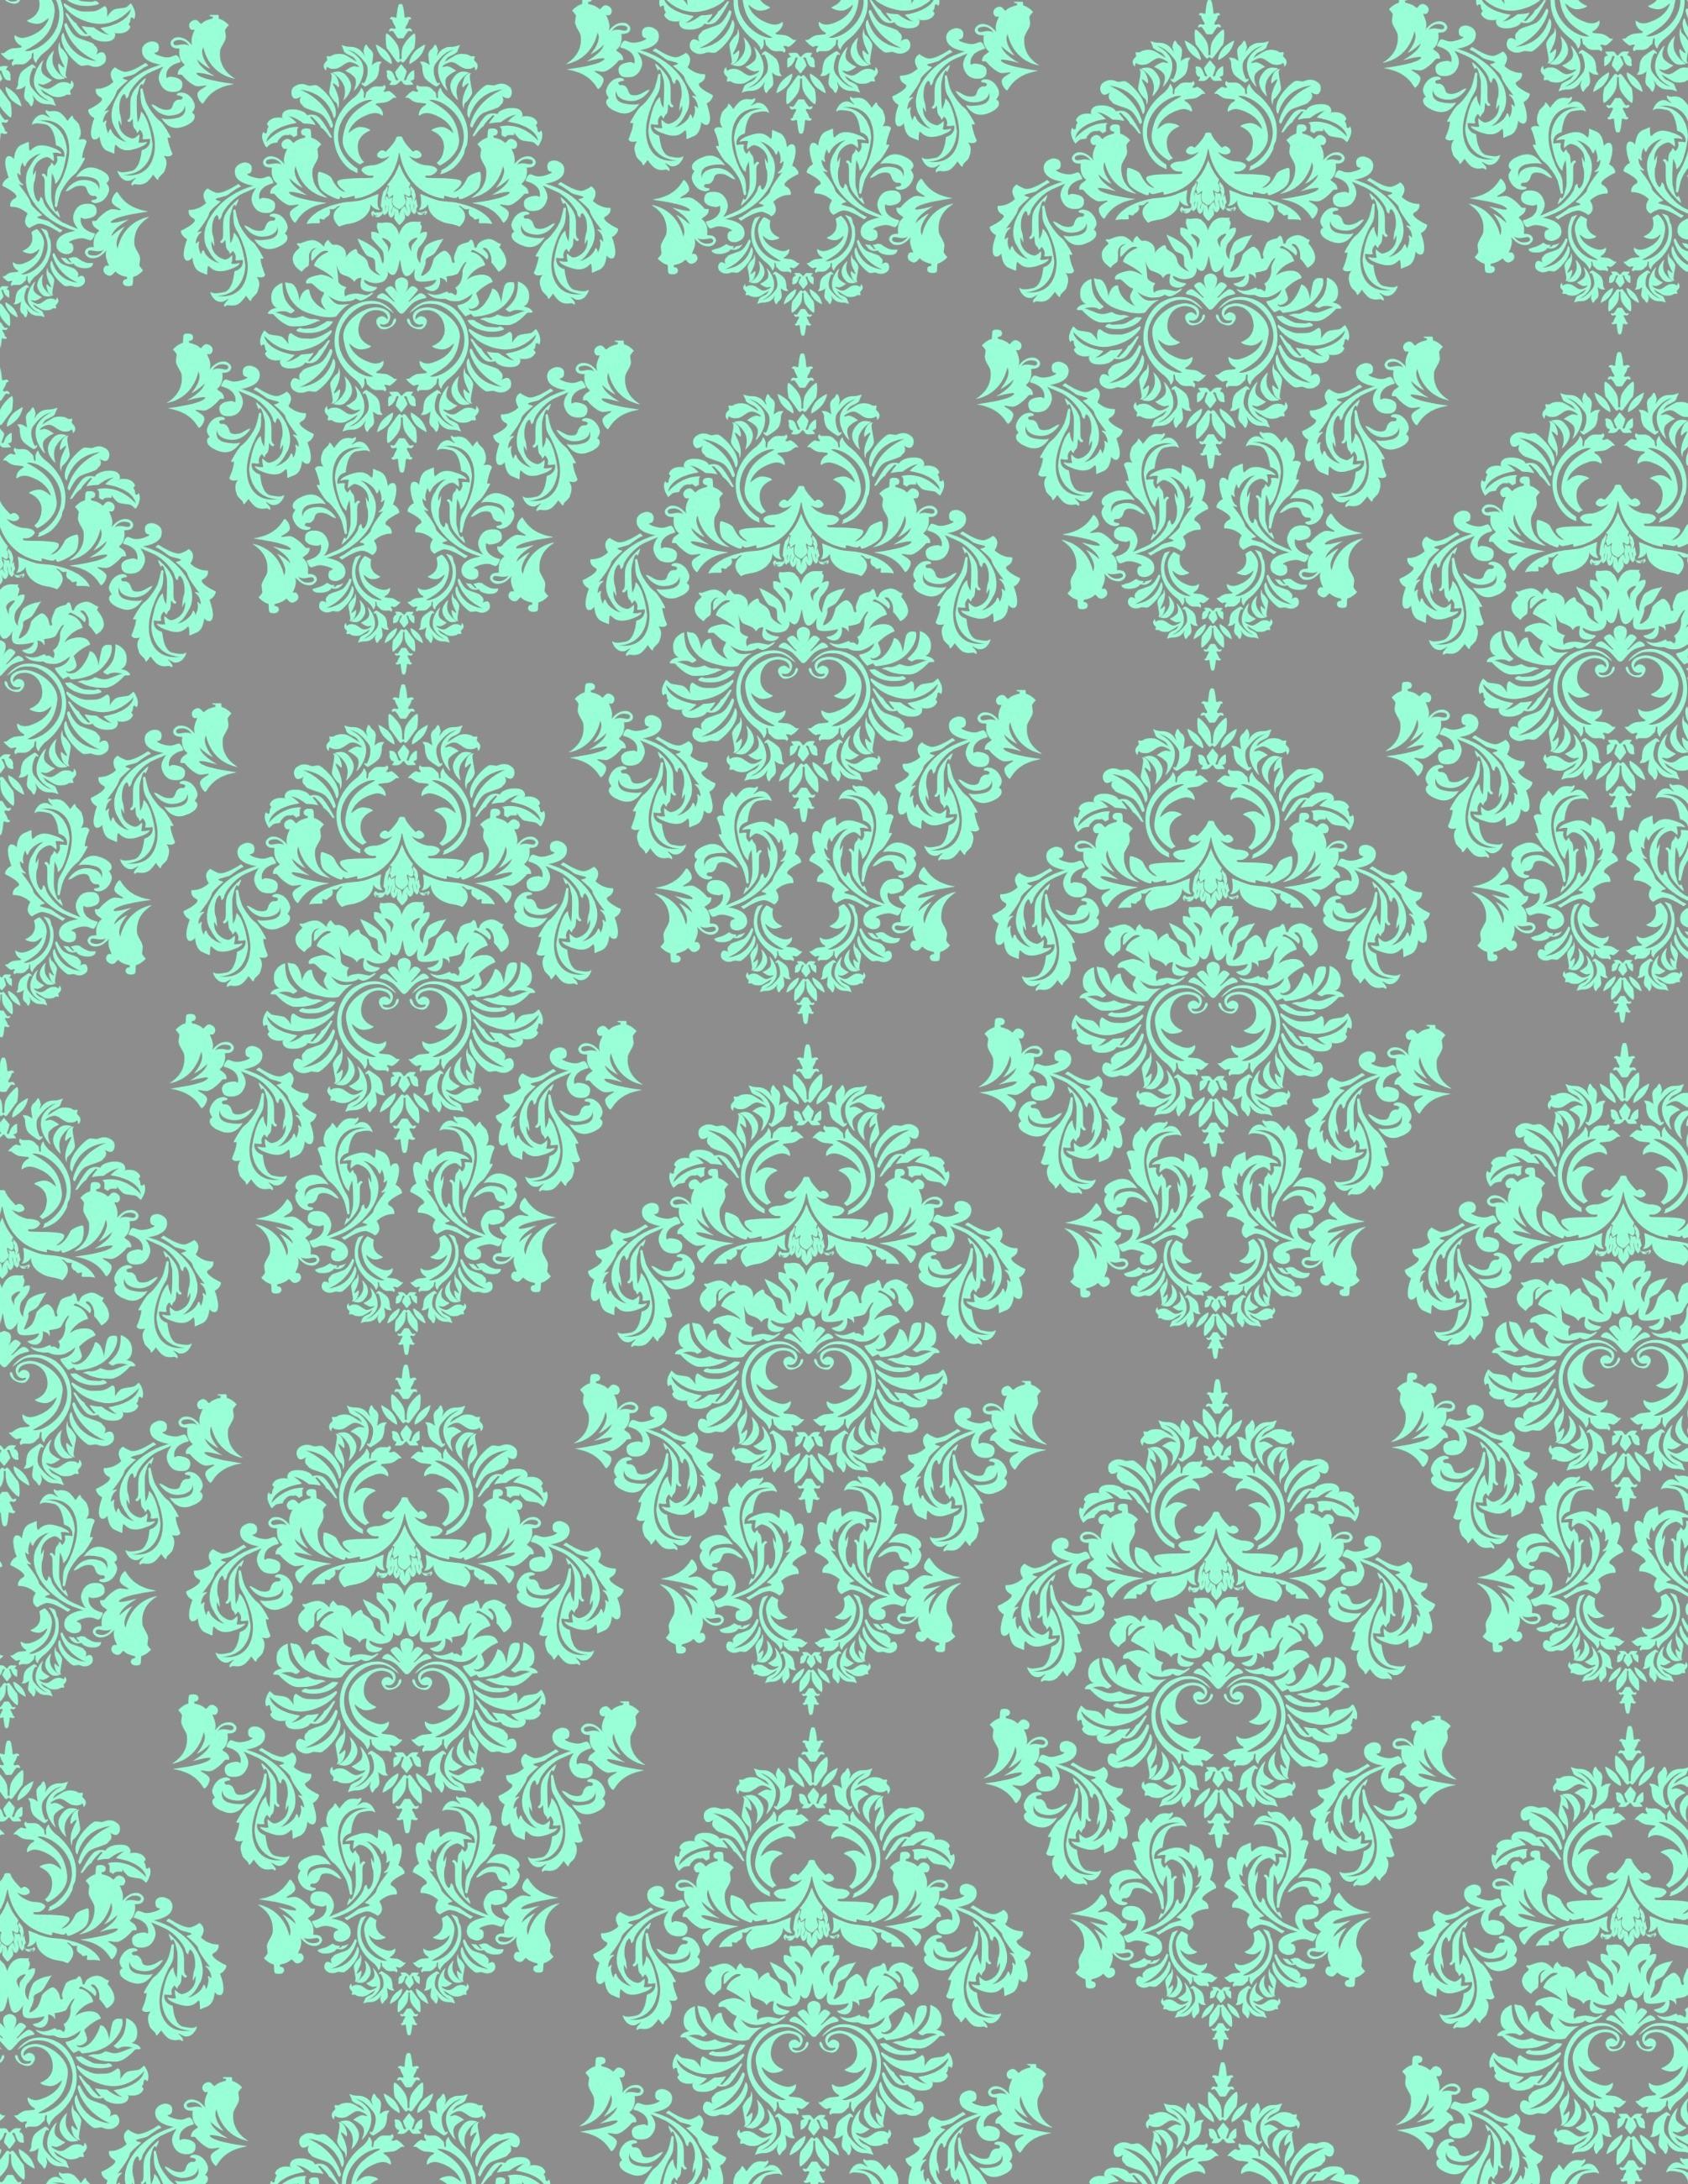 aqua damask looks great on gray background. Iphone BackgroundsWallpaper …